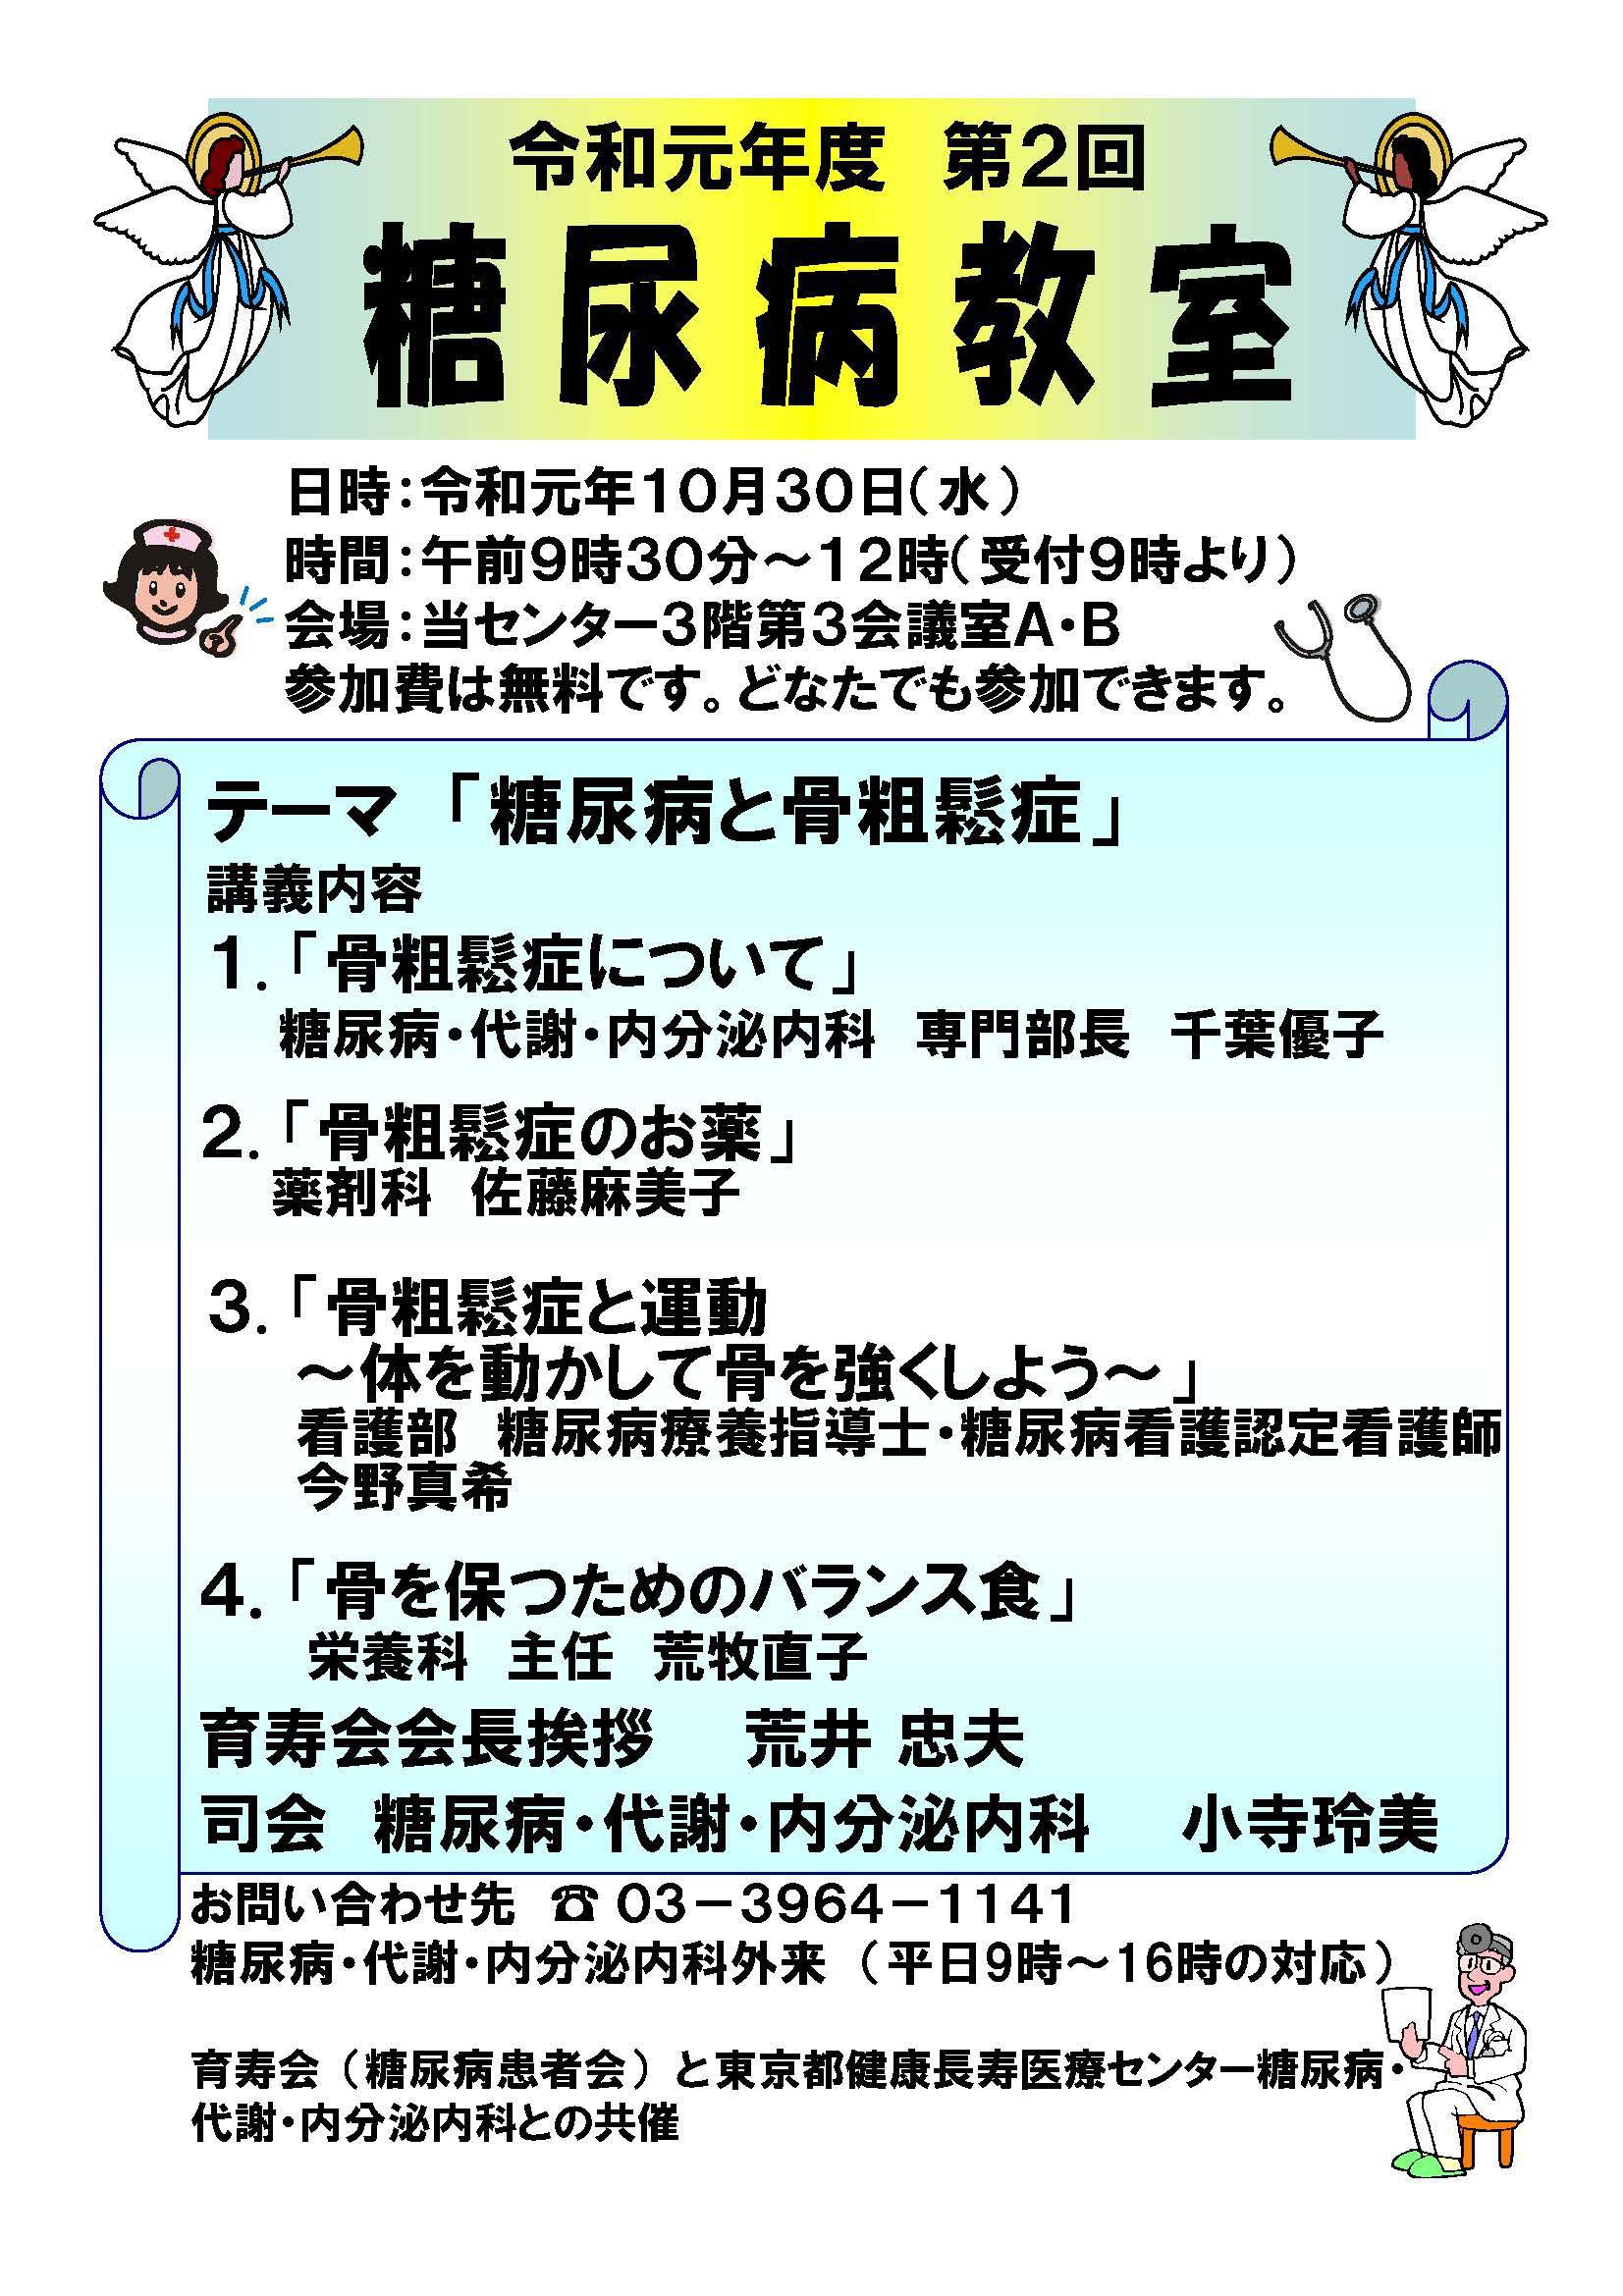 DM20191030.jpg